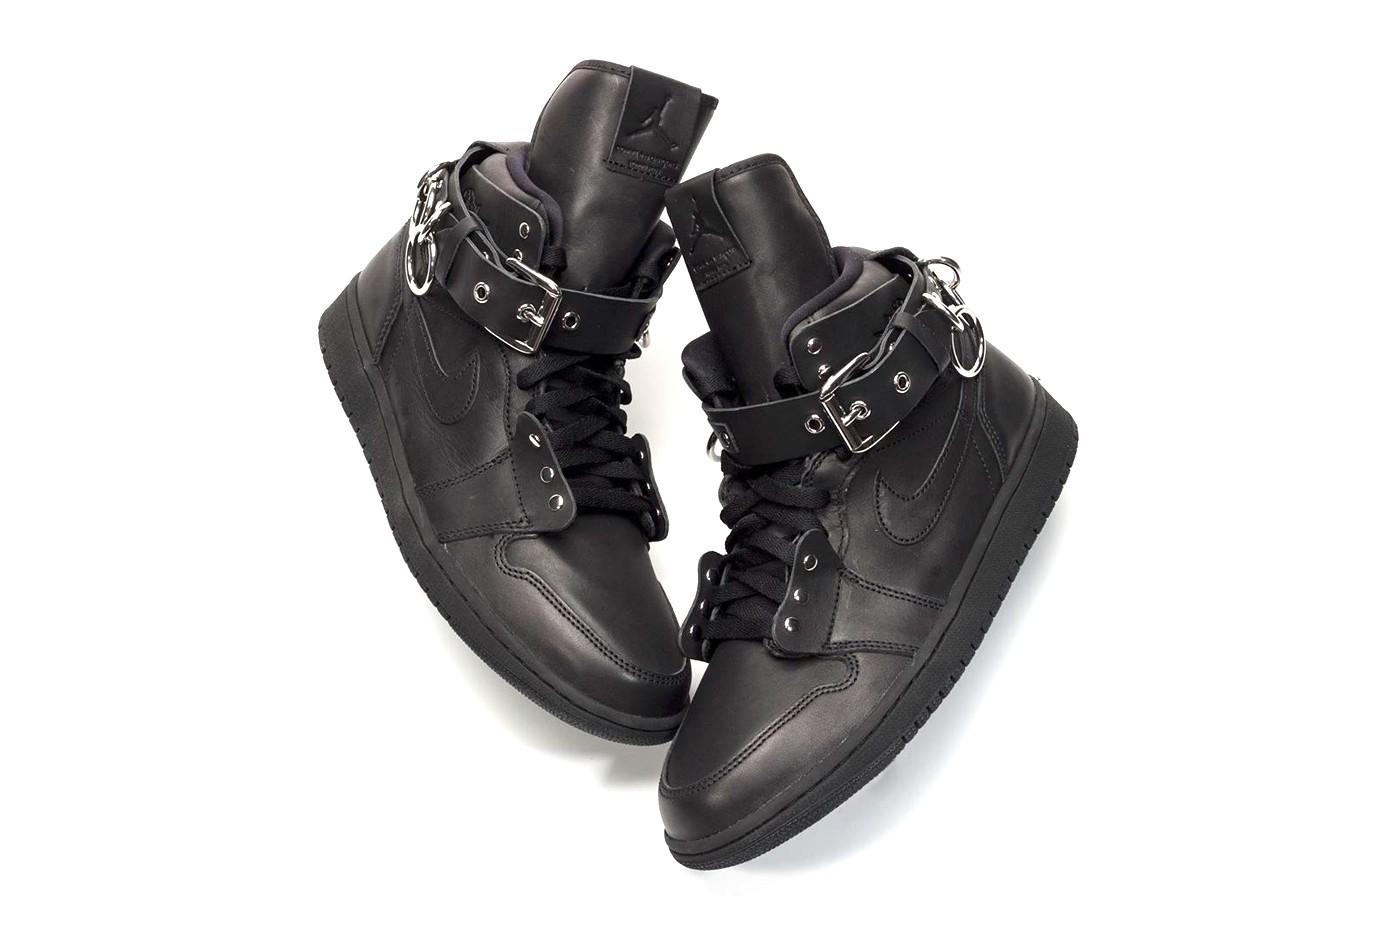 COMME des GARÇONS x Air Jordan 1 全鞋细节曝光